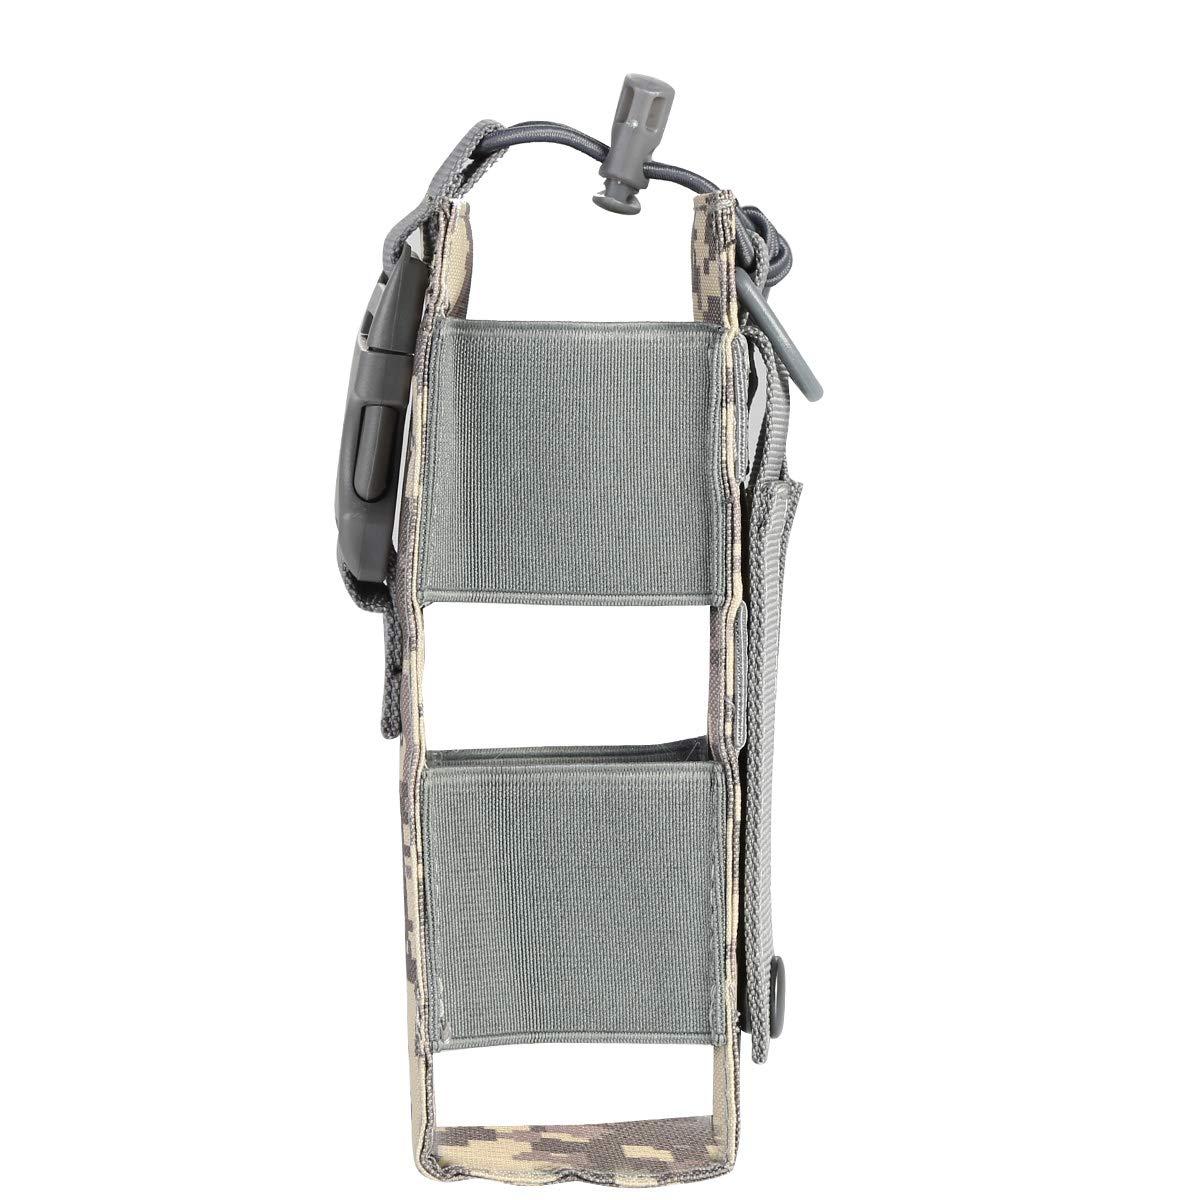 Tactical Holster Pouch Molle Cintur/ón Paquete de la Cintura Bolso Peque/ño Bolsillo Paquete Militar de la Cintura Bolsa de Viaje Bolsos de Viaje para Acampar Jinxuny Walkie Talkie Holder Pocket